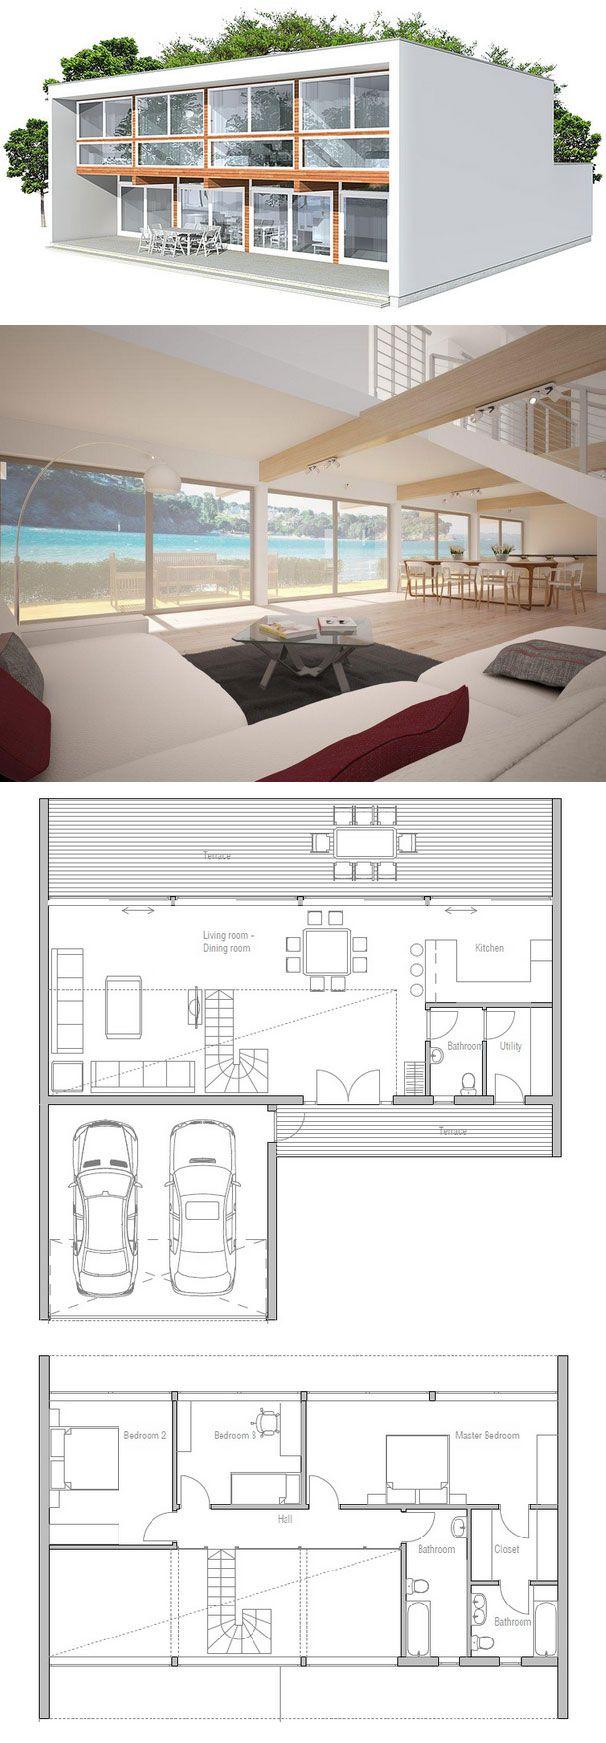 House Plan http://platinum.harcourts.co.za/Profile/Dino-Venturino/15705 www.harcourtspropery@wordpress.com dino.venturino@harcourts.co.za 0797398635